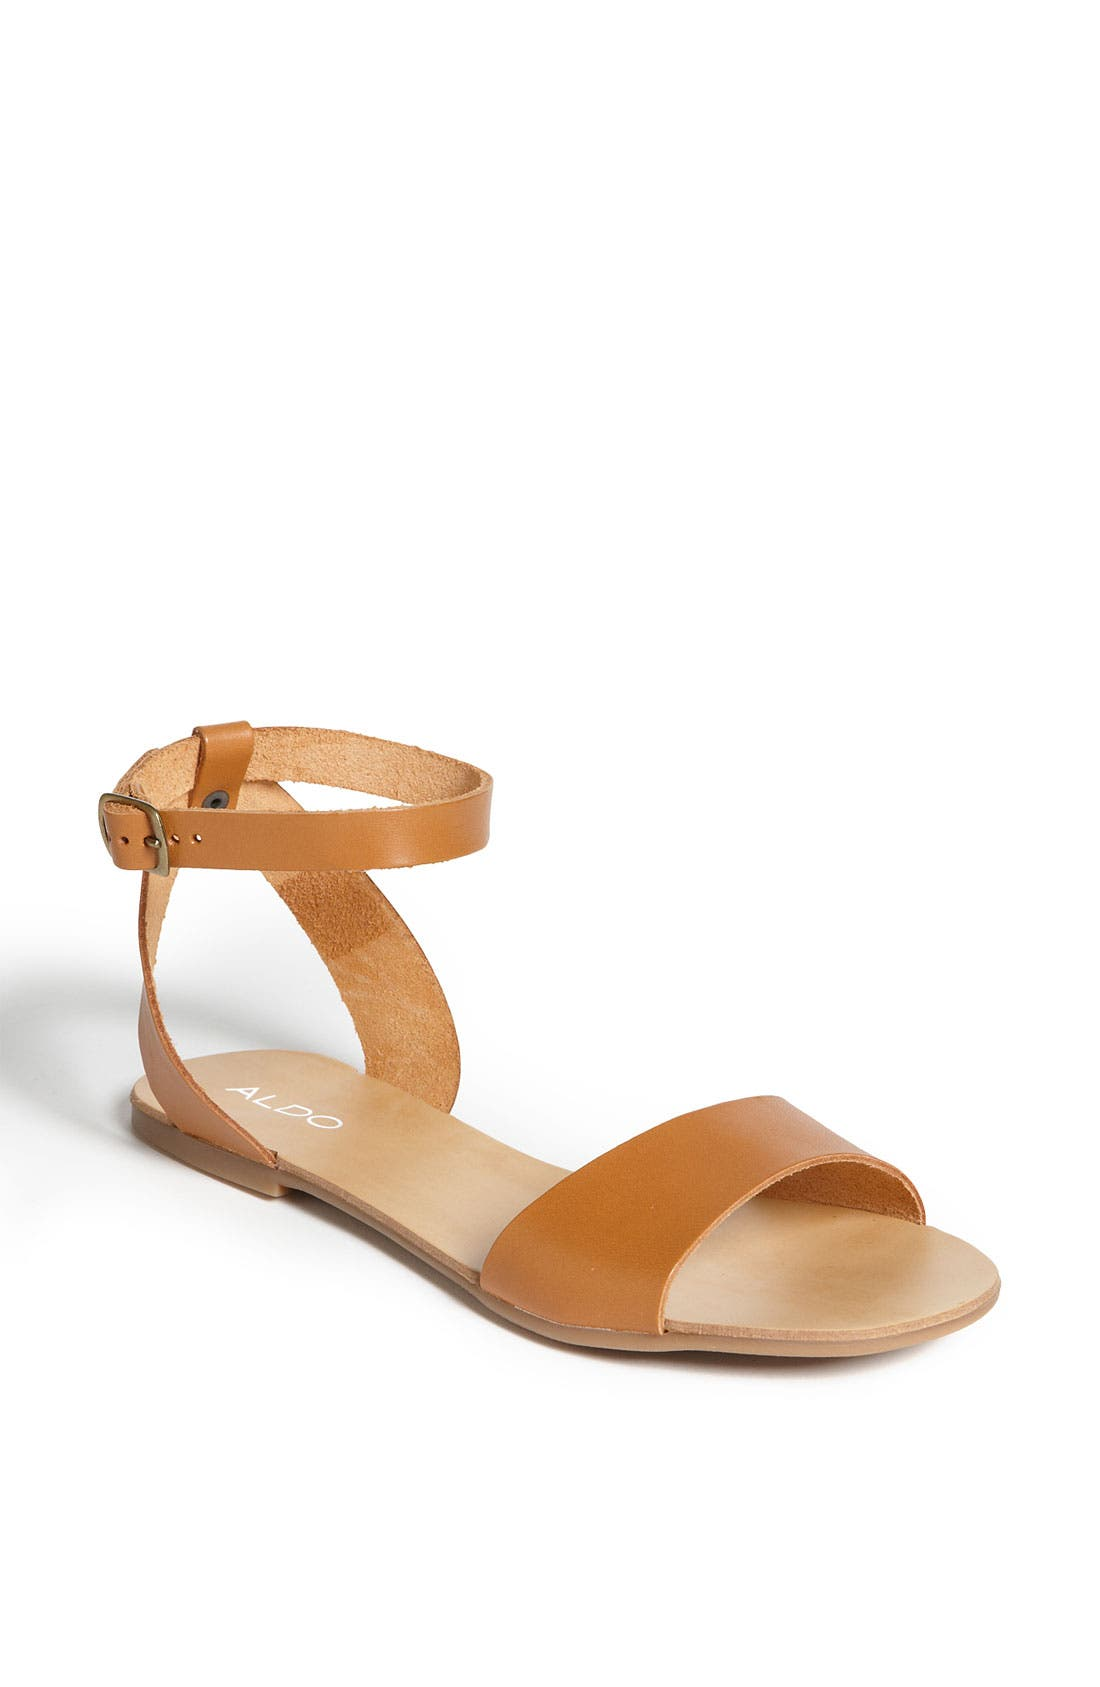 Alternate Image 1 Selected - ALDO 'Brendle' Sandal